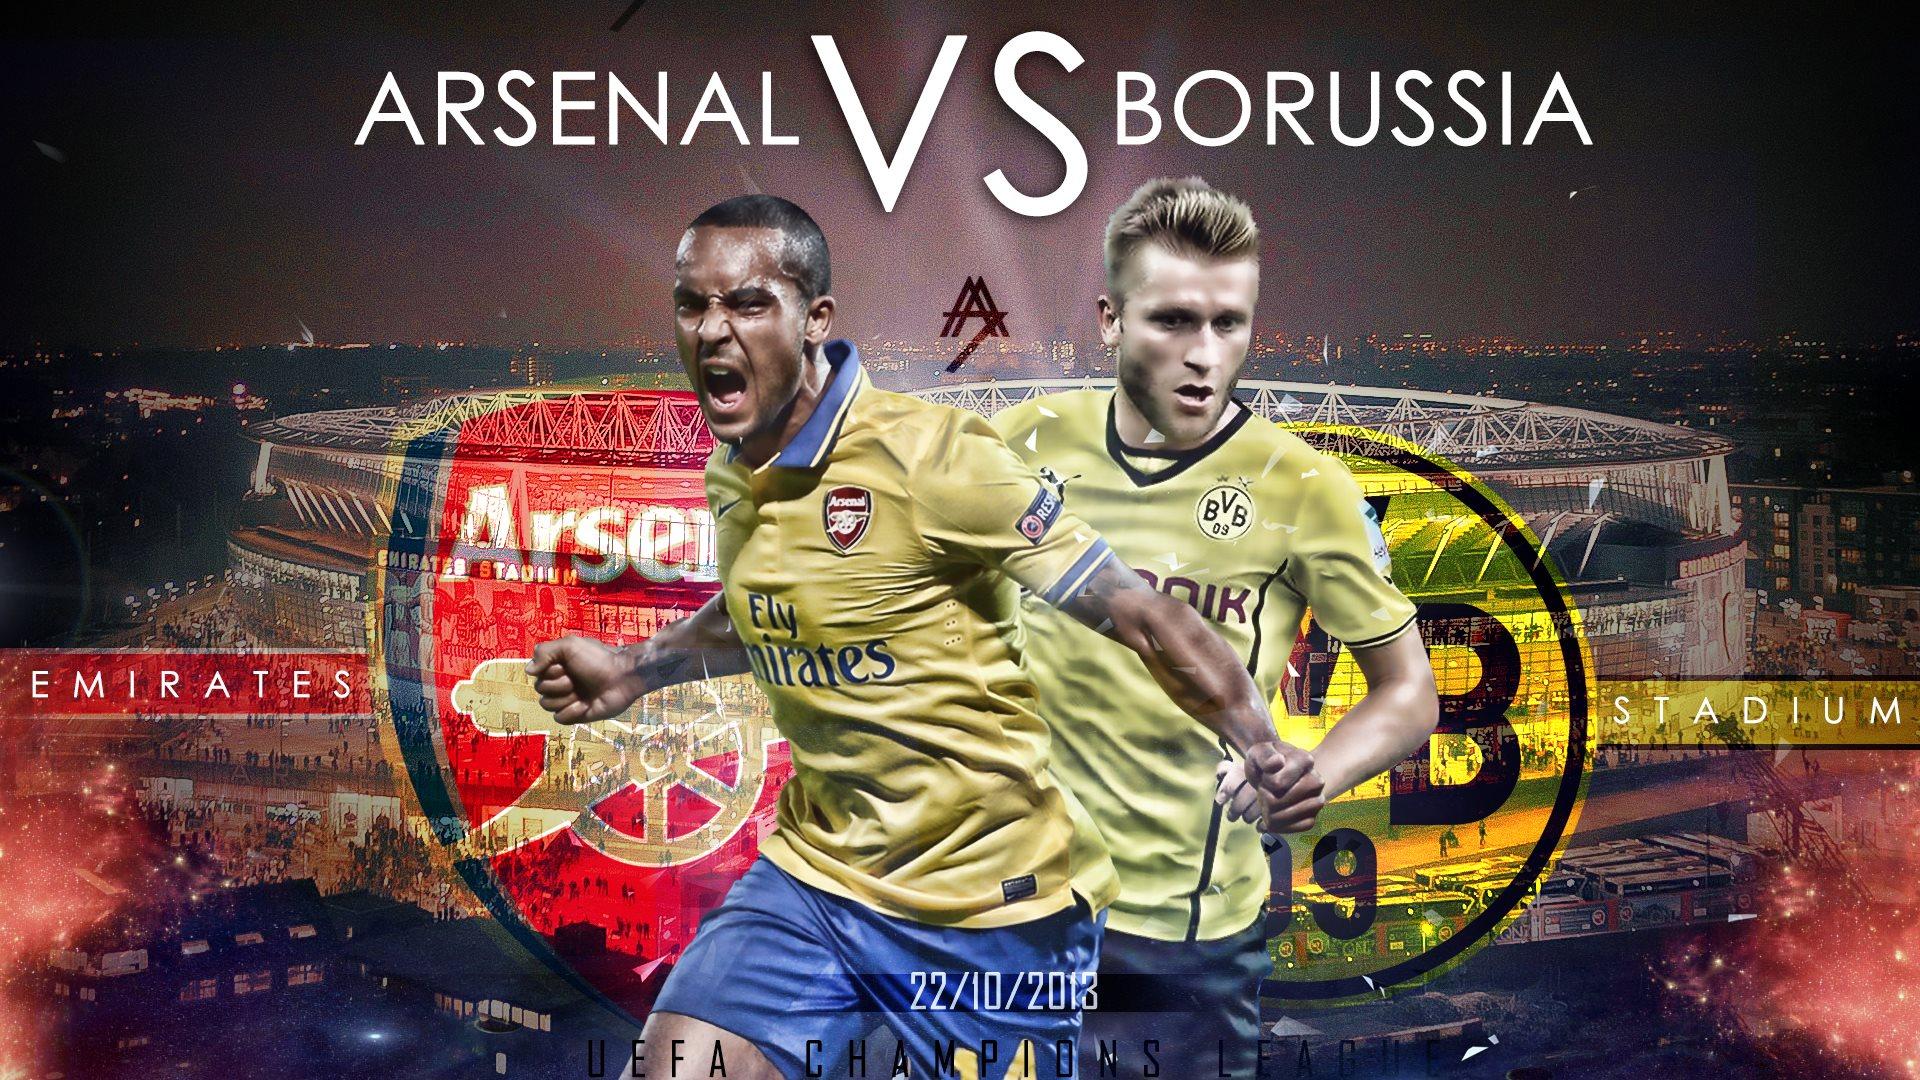 Arsenal vs BvB Wallpapers HD Wallpapers 1920x1080